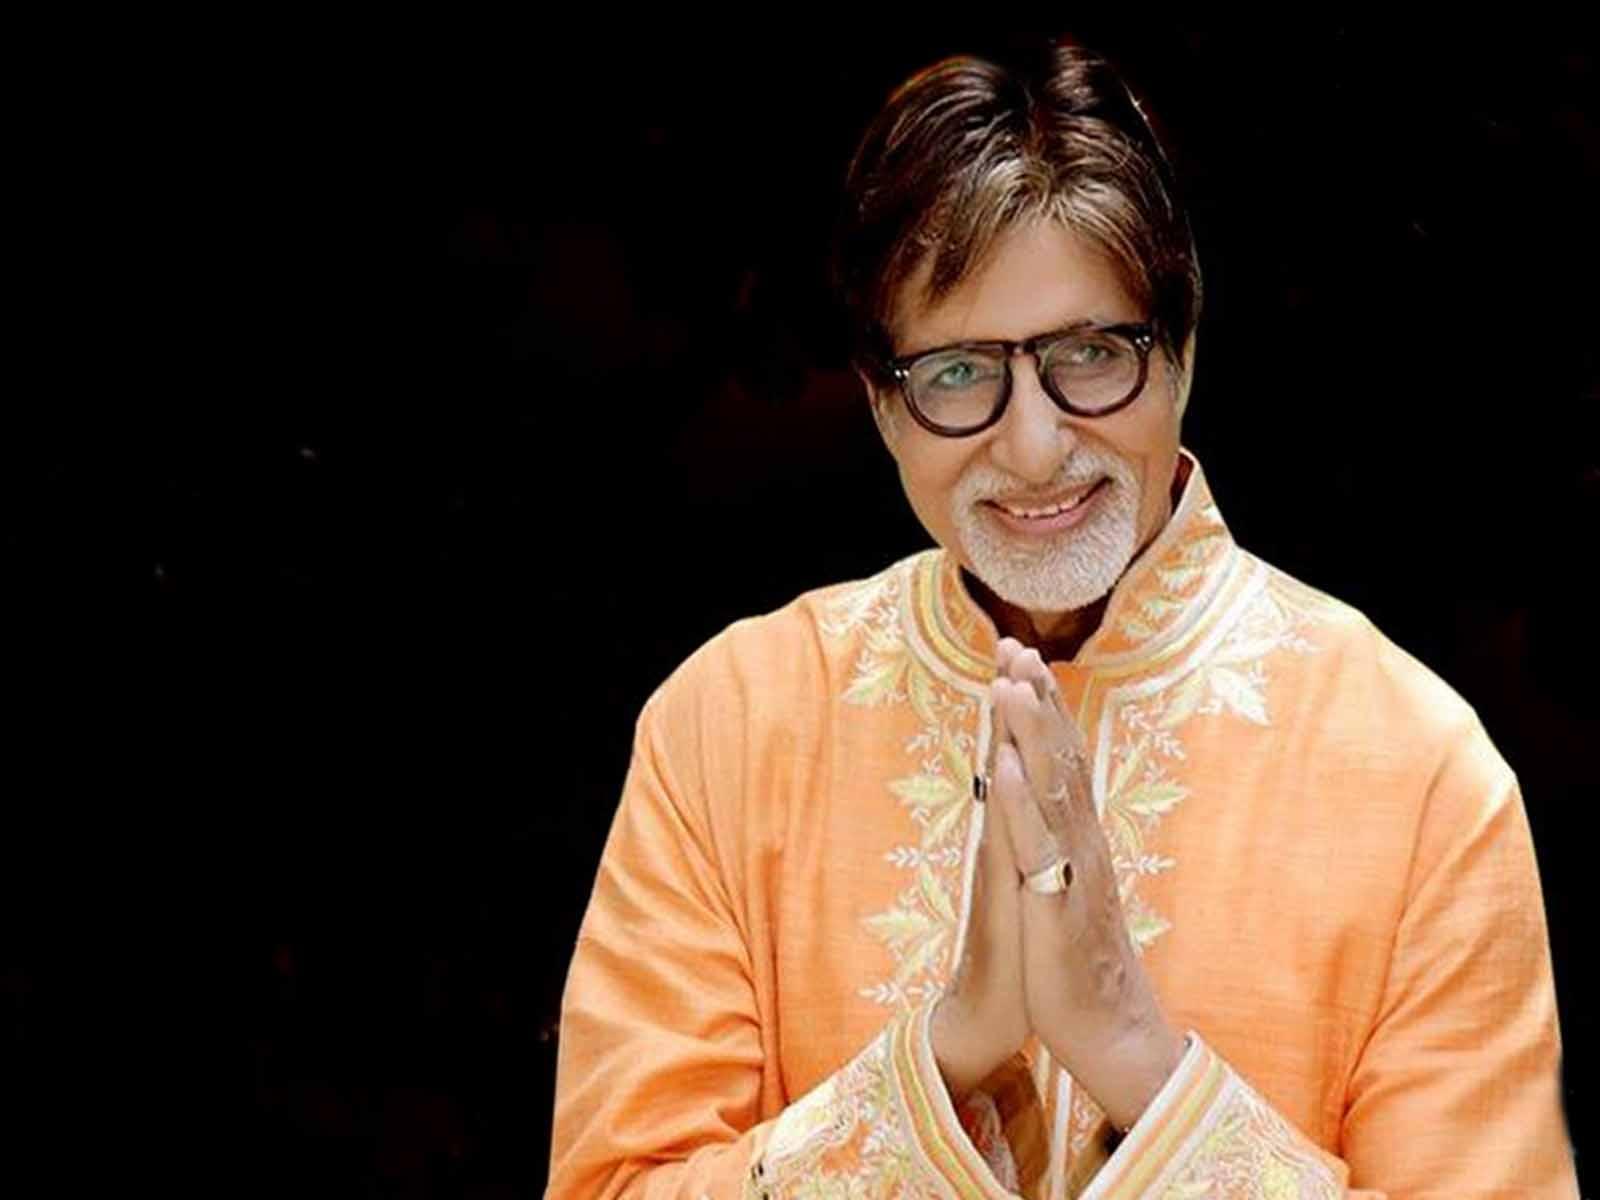 Amitabh Bachchan Wallpapers hd